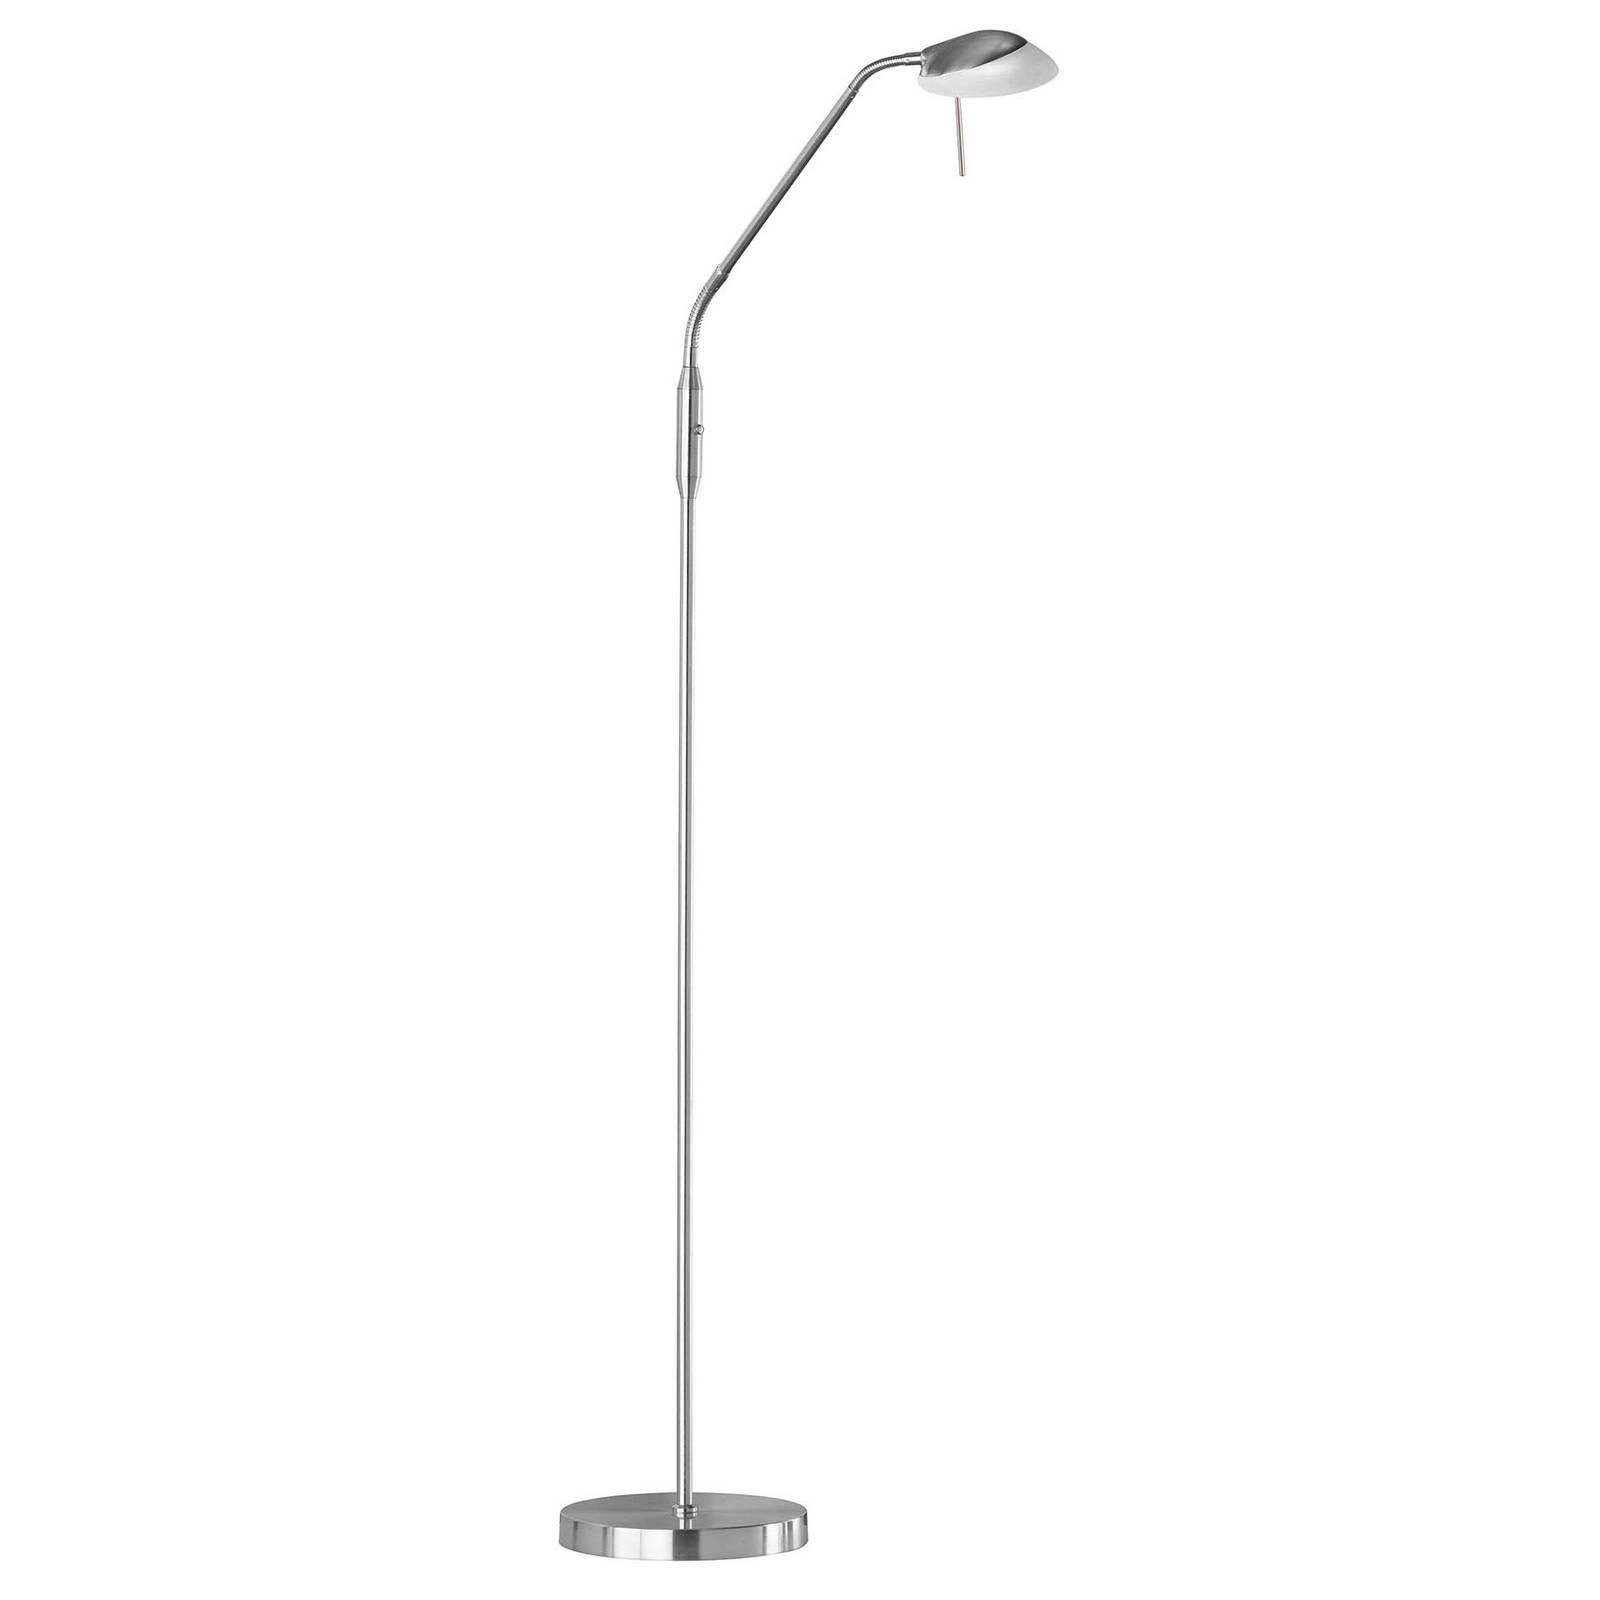 LED-Stehleuchte Pool TW, einflammig, nickel